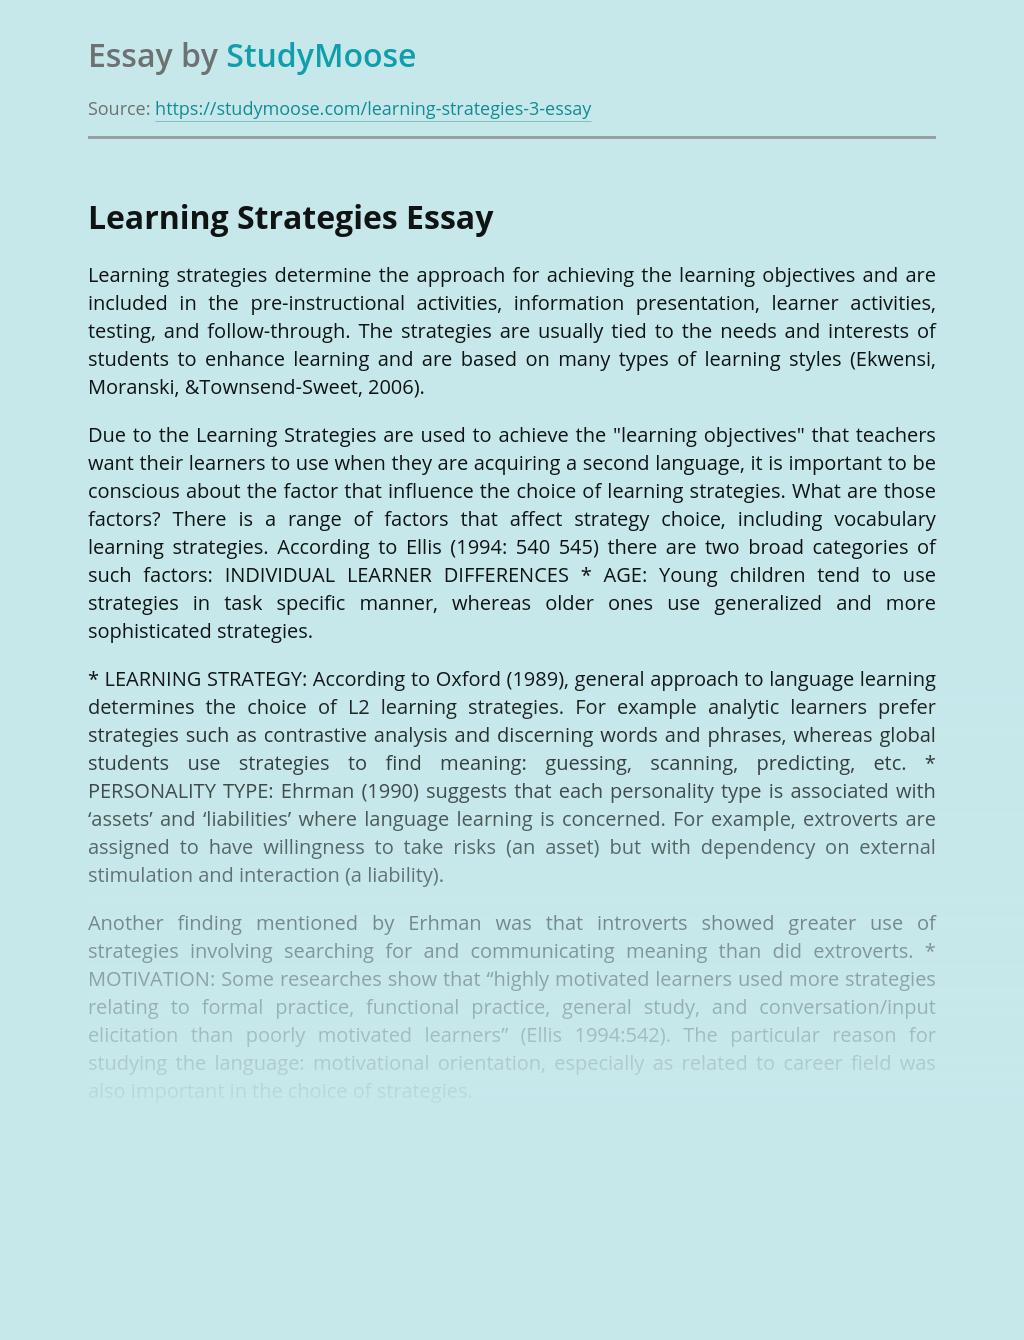 Learning Strategies Essentials